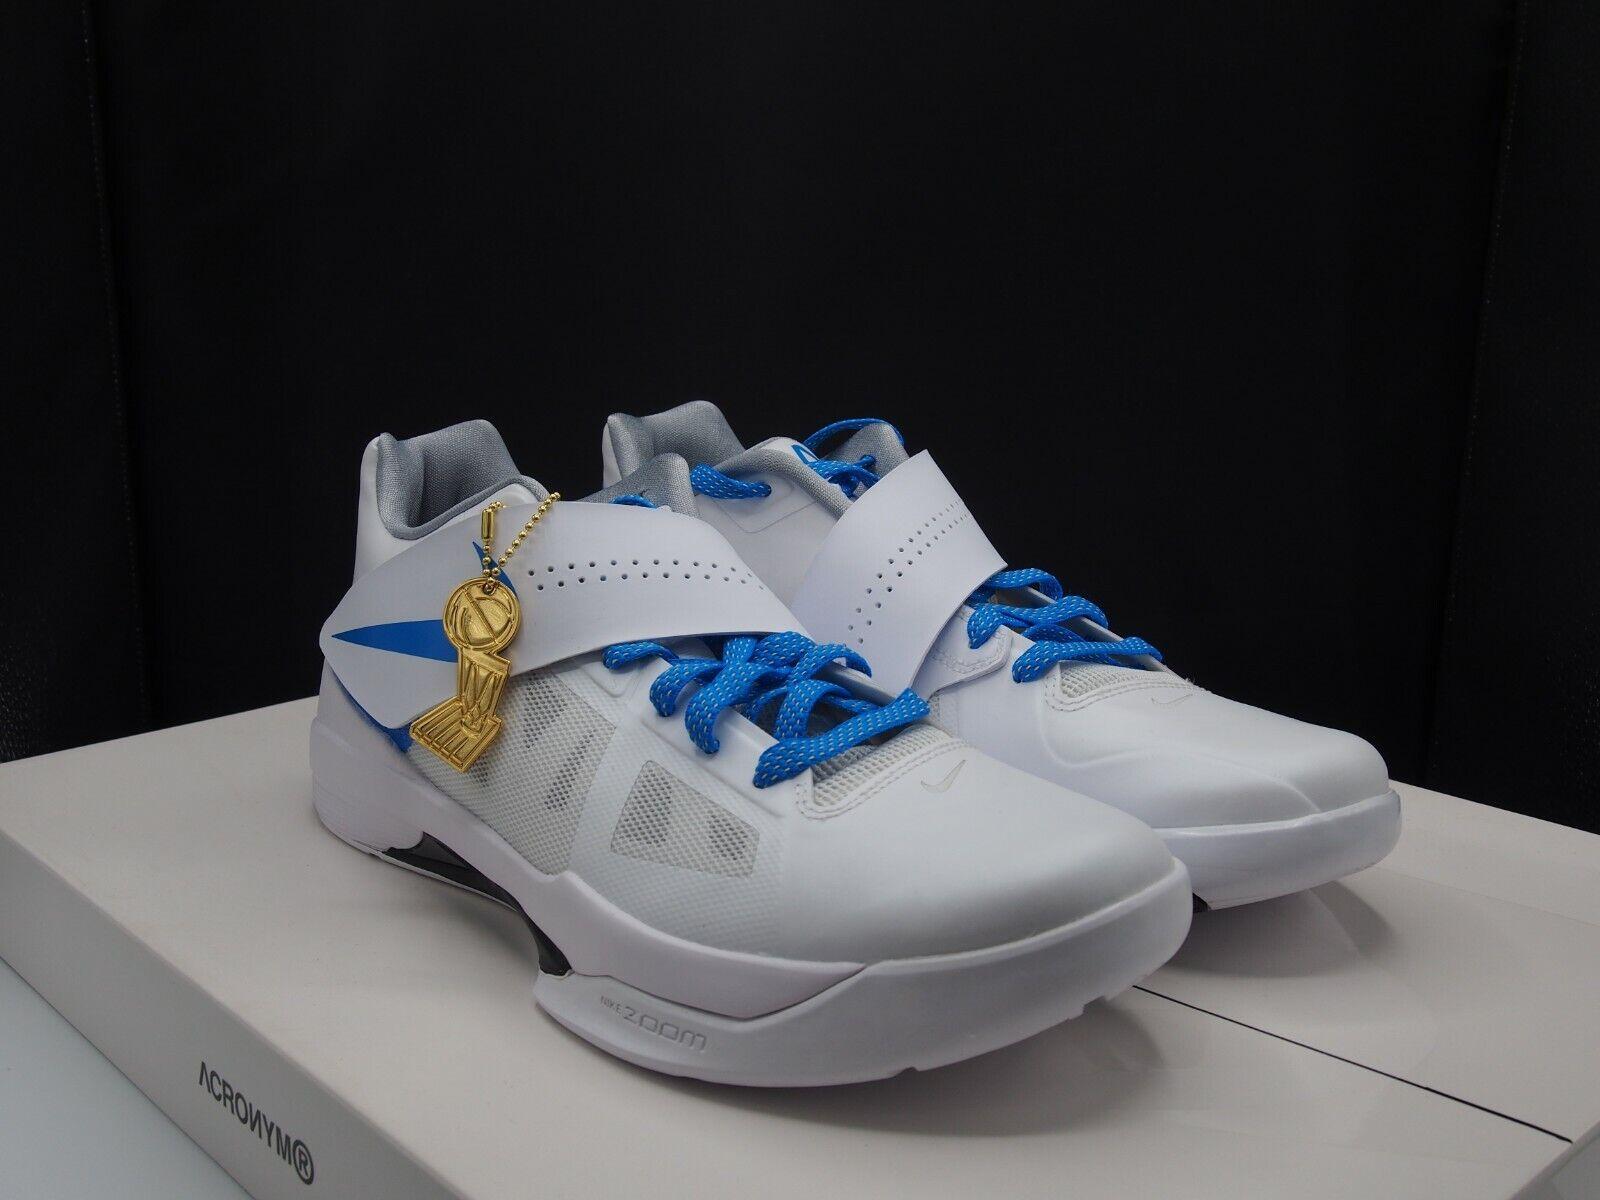 Nike Zoom KD IV CT16 QS AQ5103-100 Men's size 10.5 US